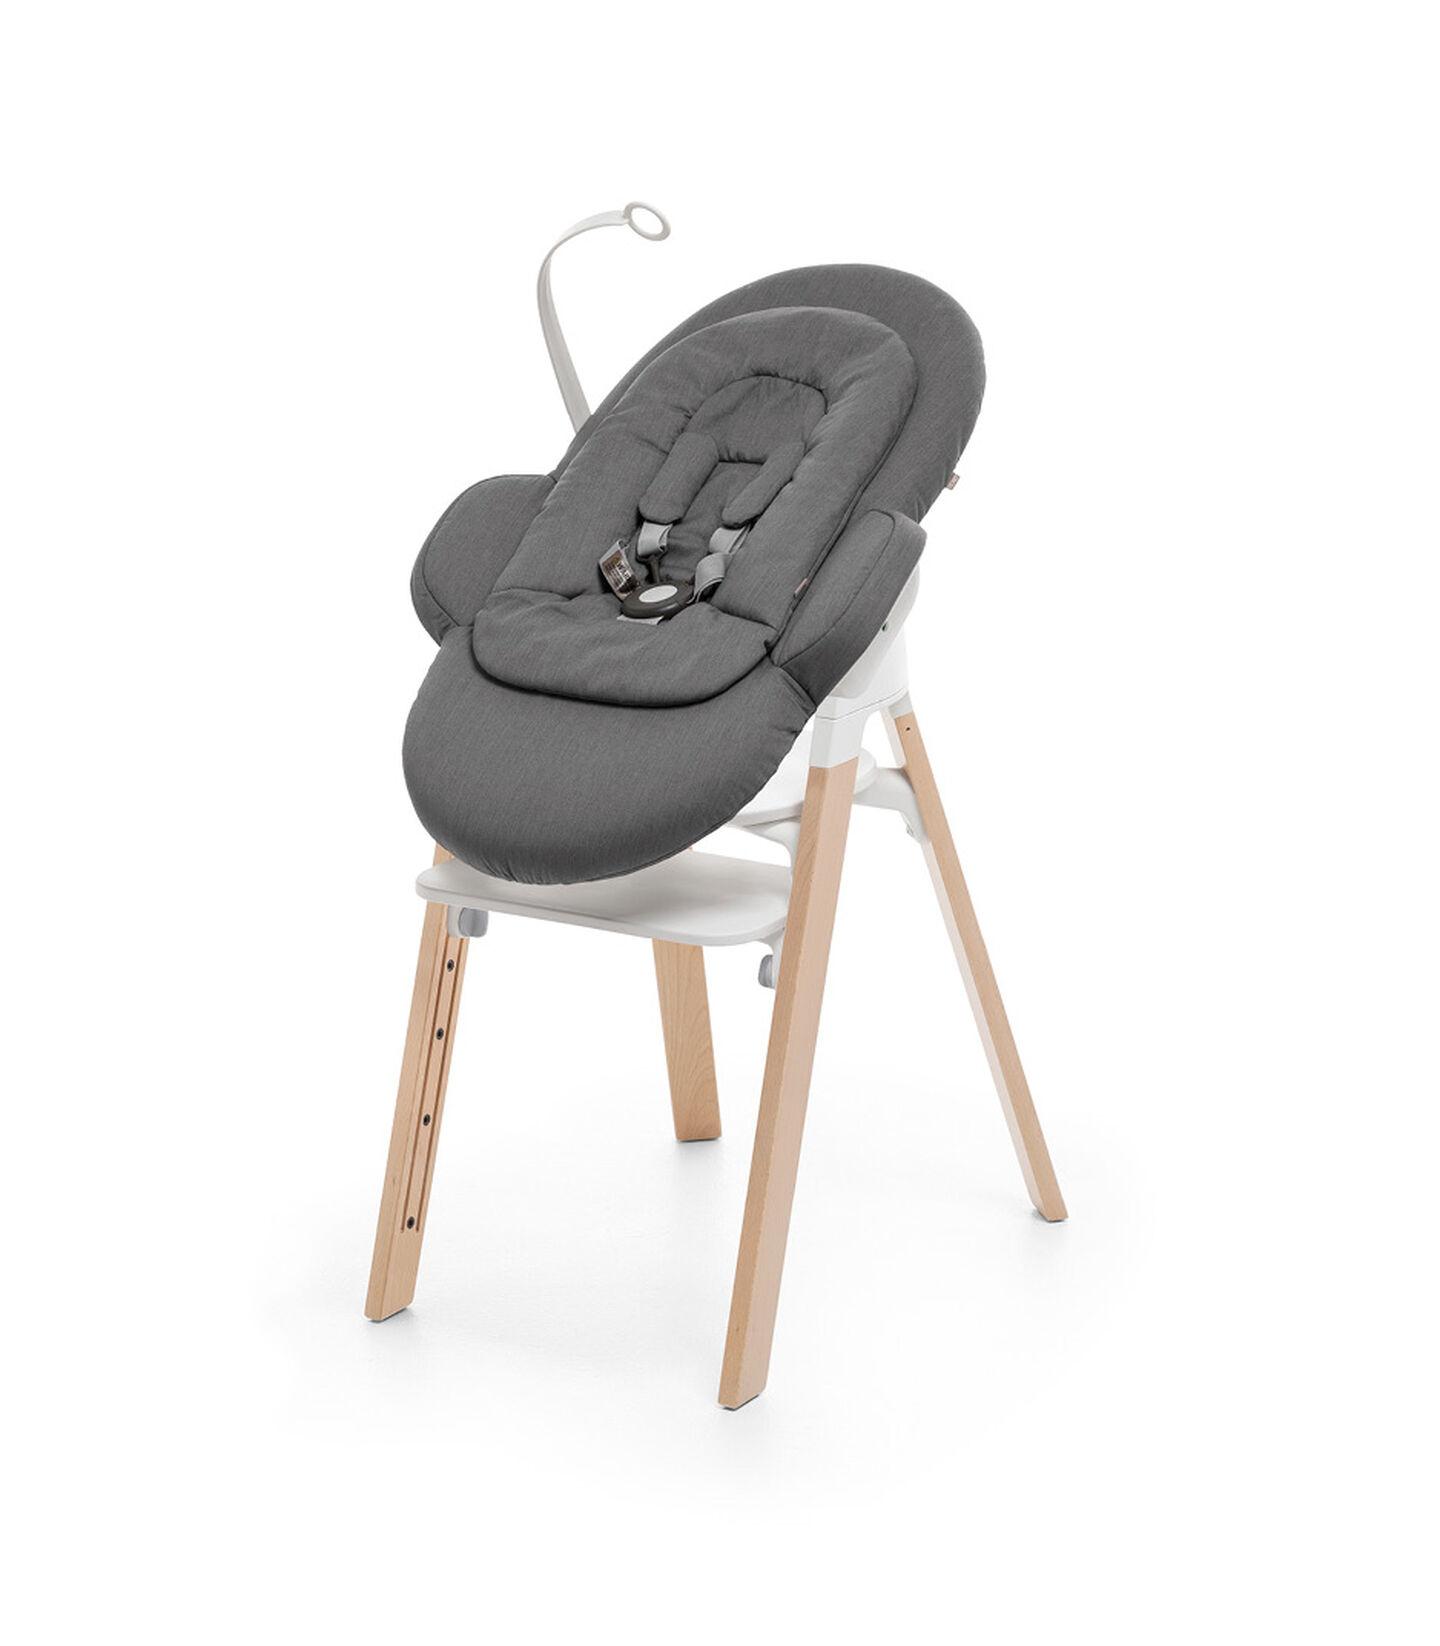 "Stokke® Steps"" Chair, Beech Natural, with Newborn Set Deep Grey. view 2"